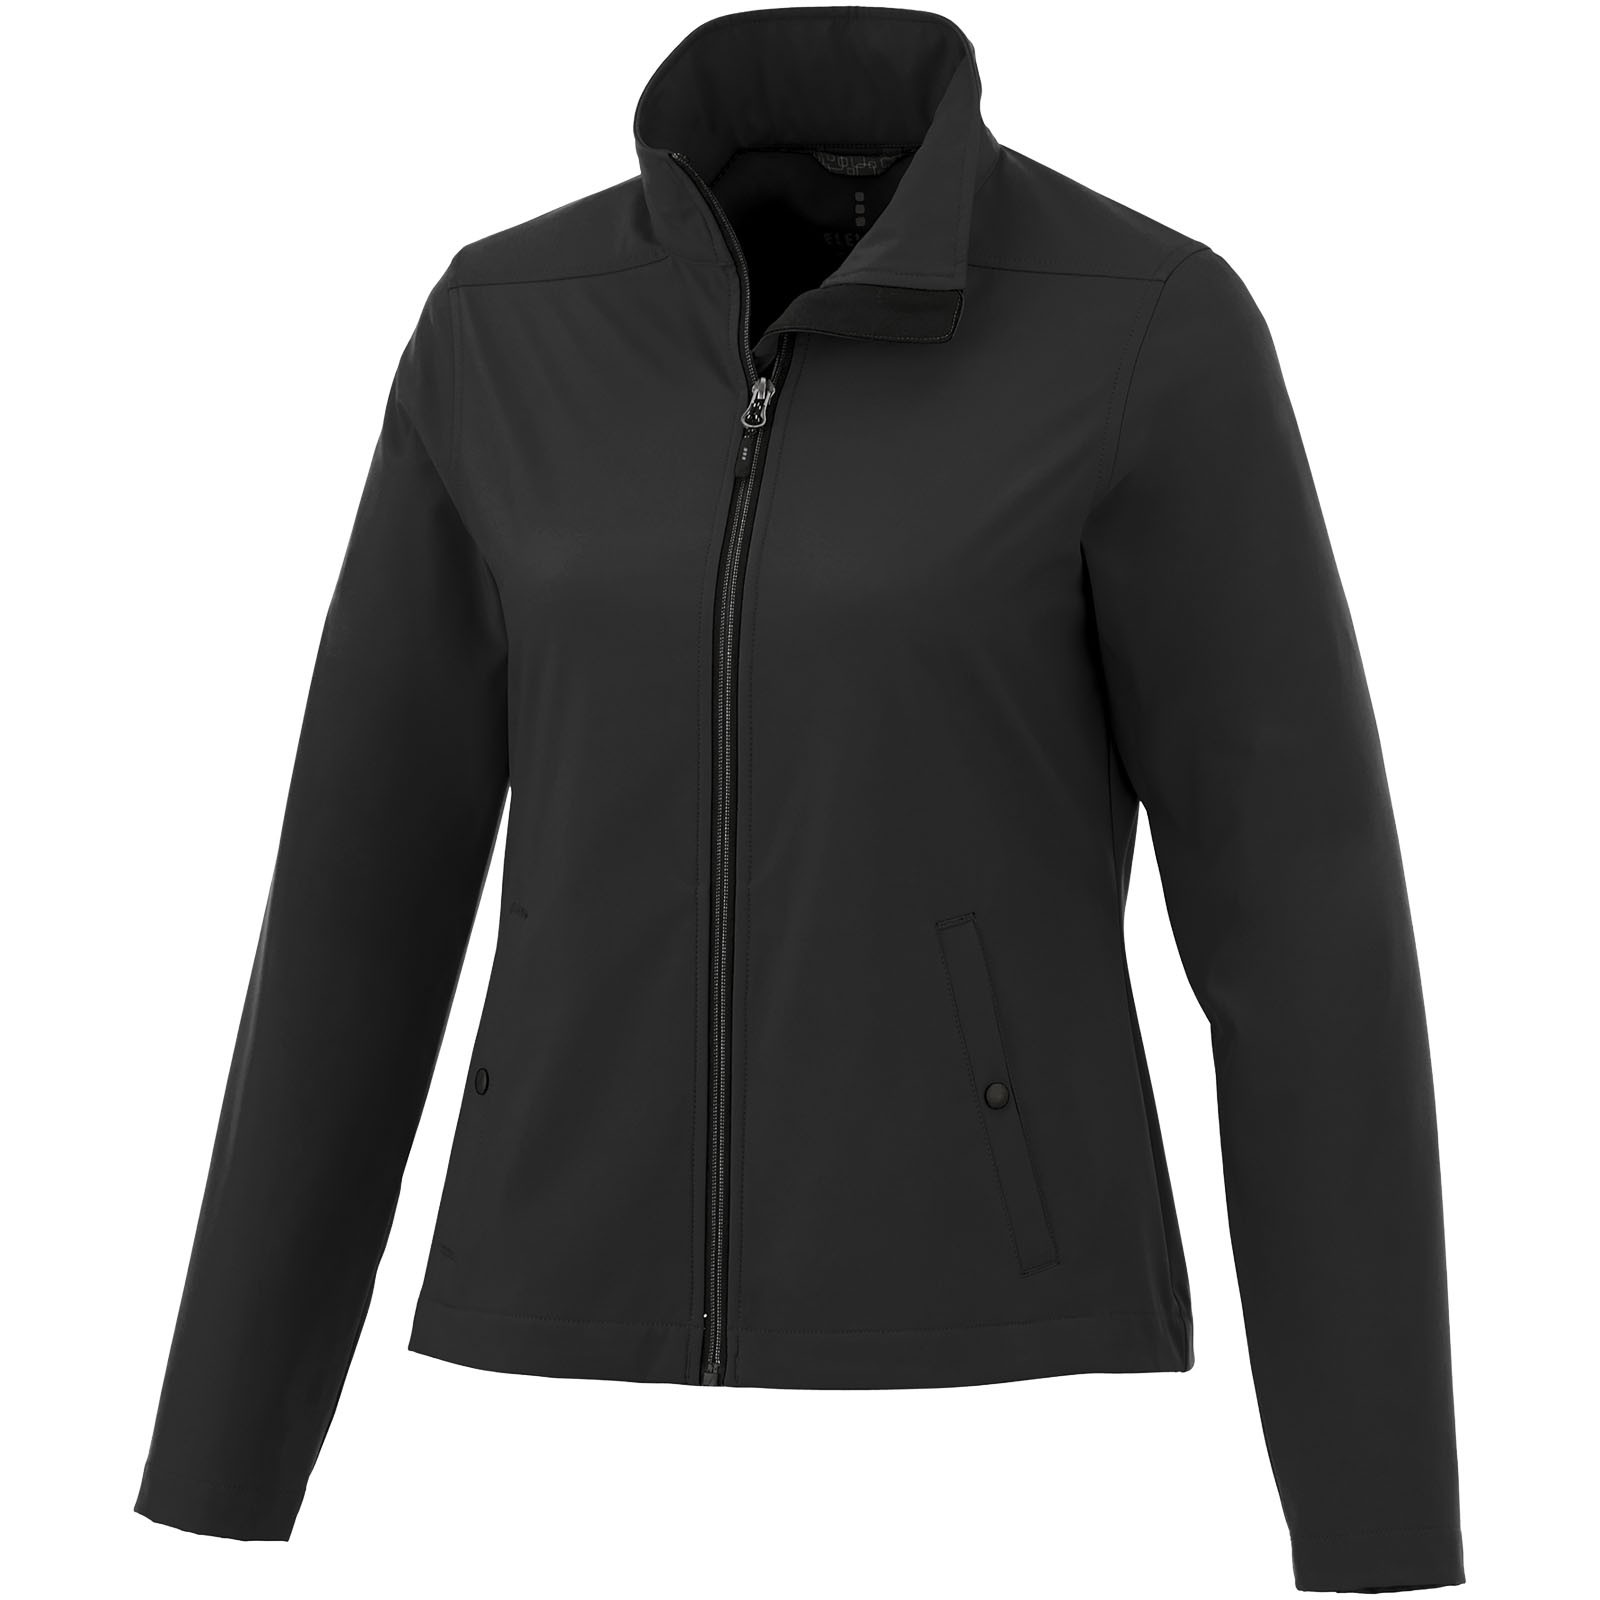 Karmine women's softshell jacket - Solid Black / XL